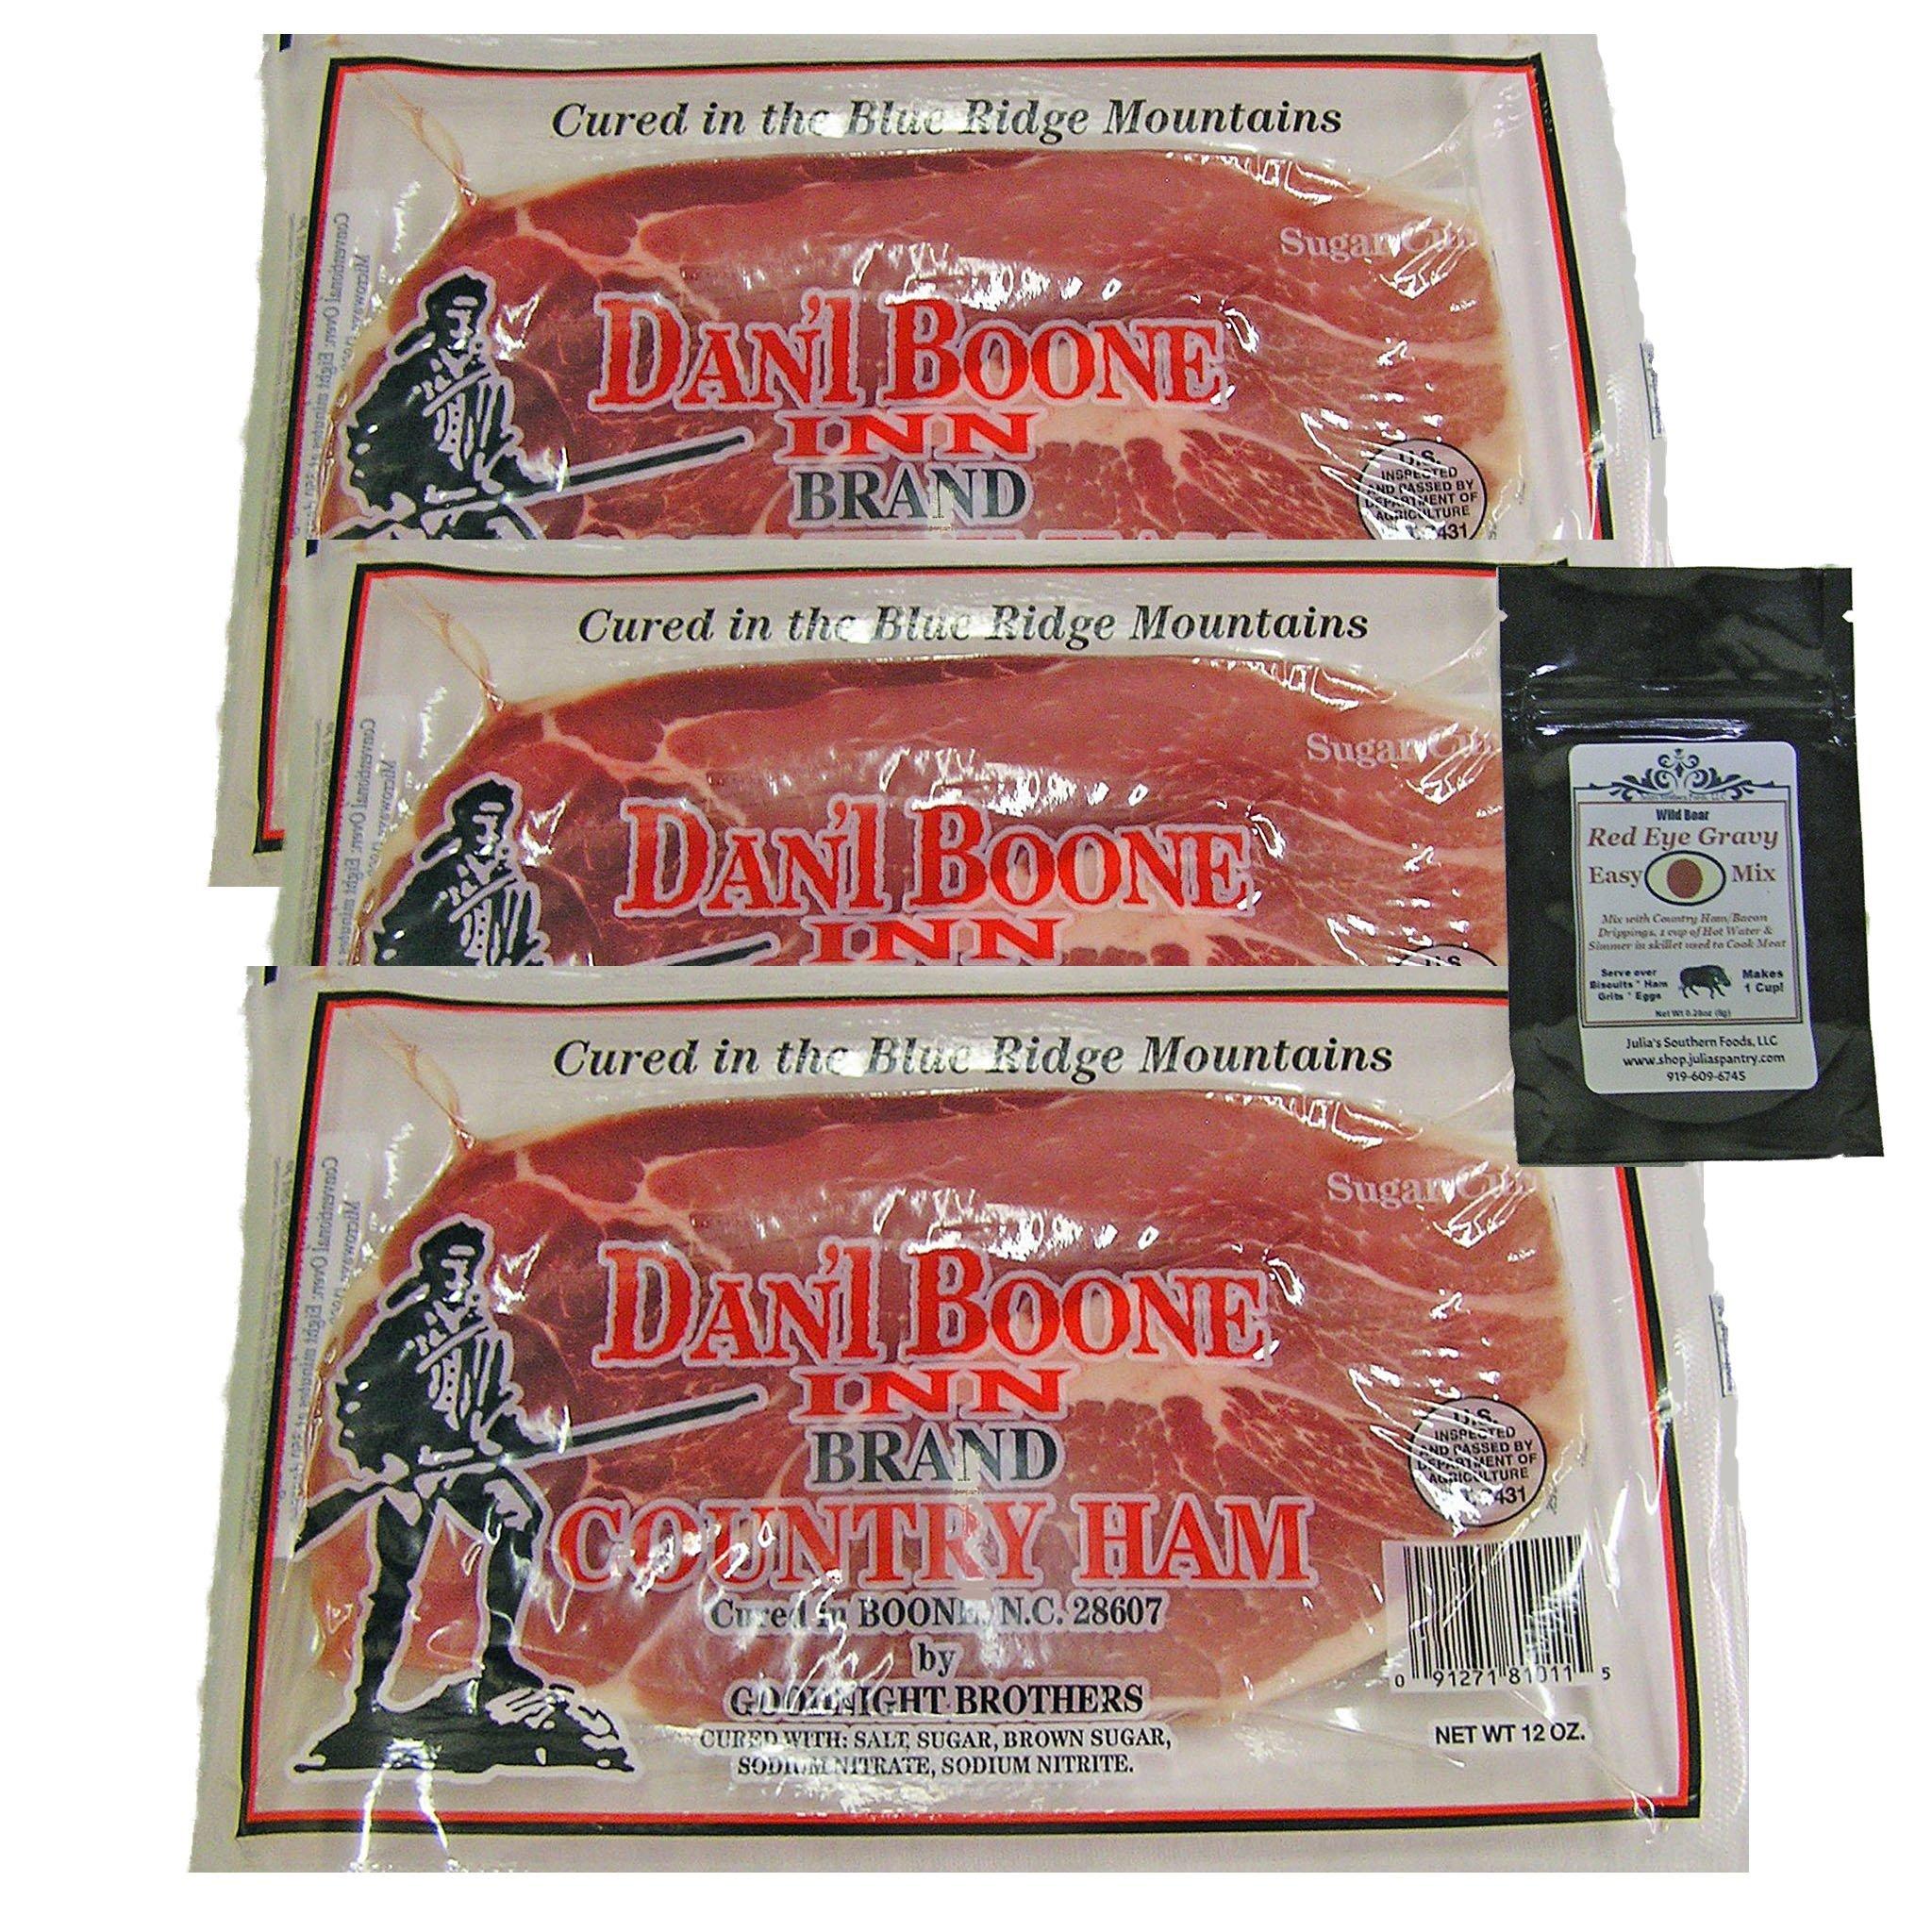 Dan'l Boone Country Ham 3-12oz Pkgs (2 1/4 Lbs) with Red Eye Gravy Sample